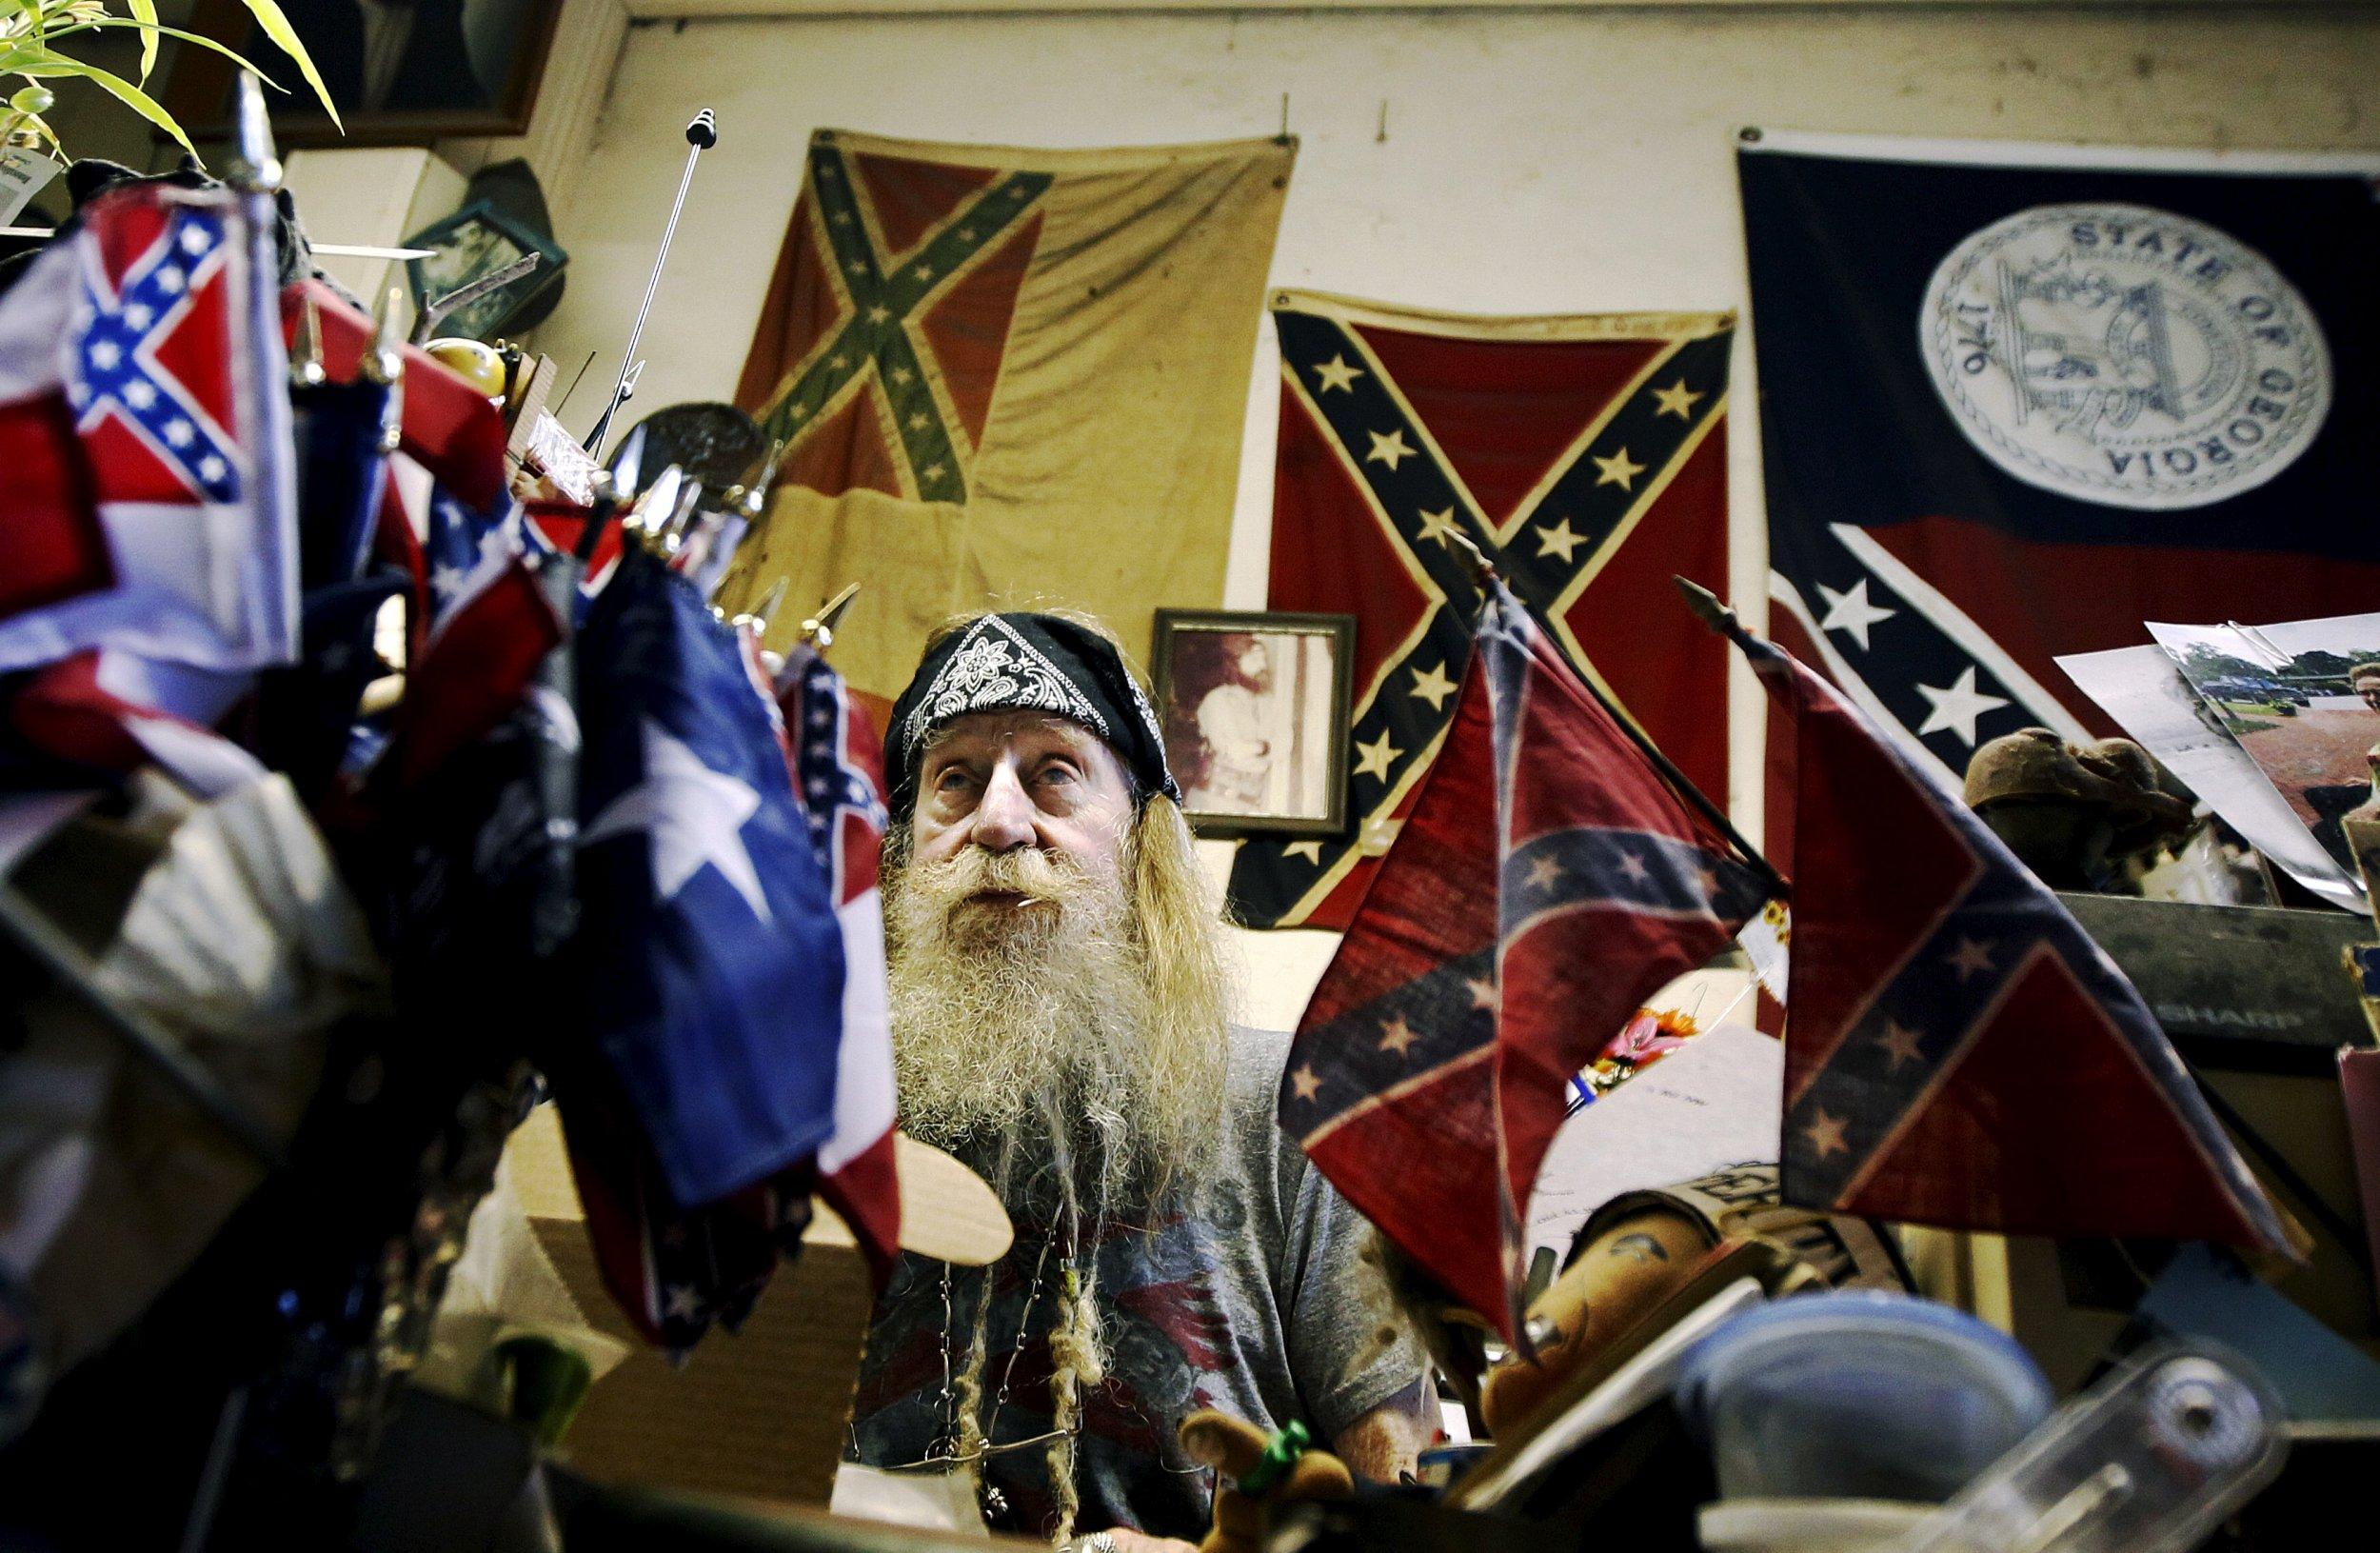 8_10_2015_Confederate_Flags